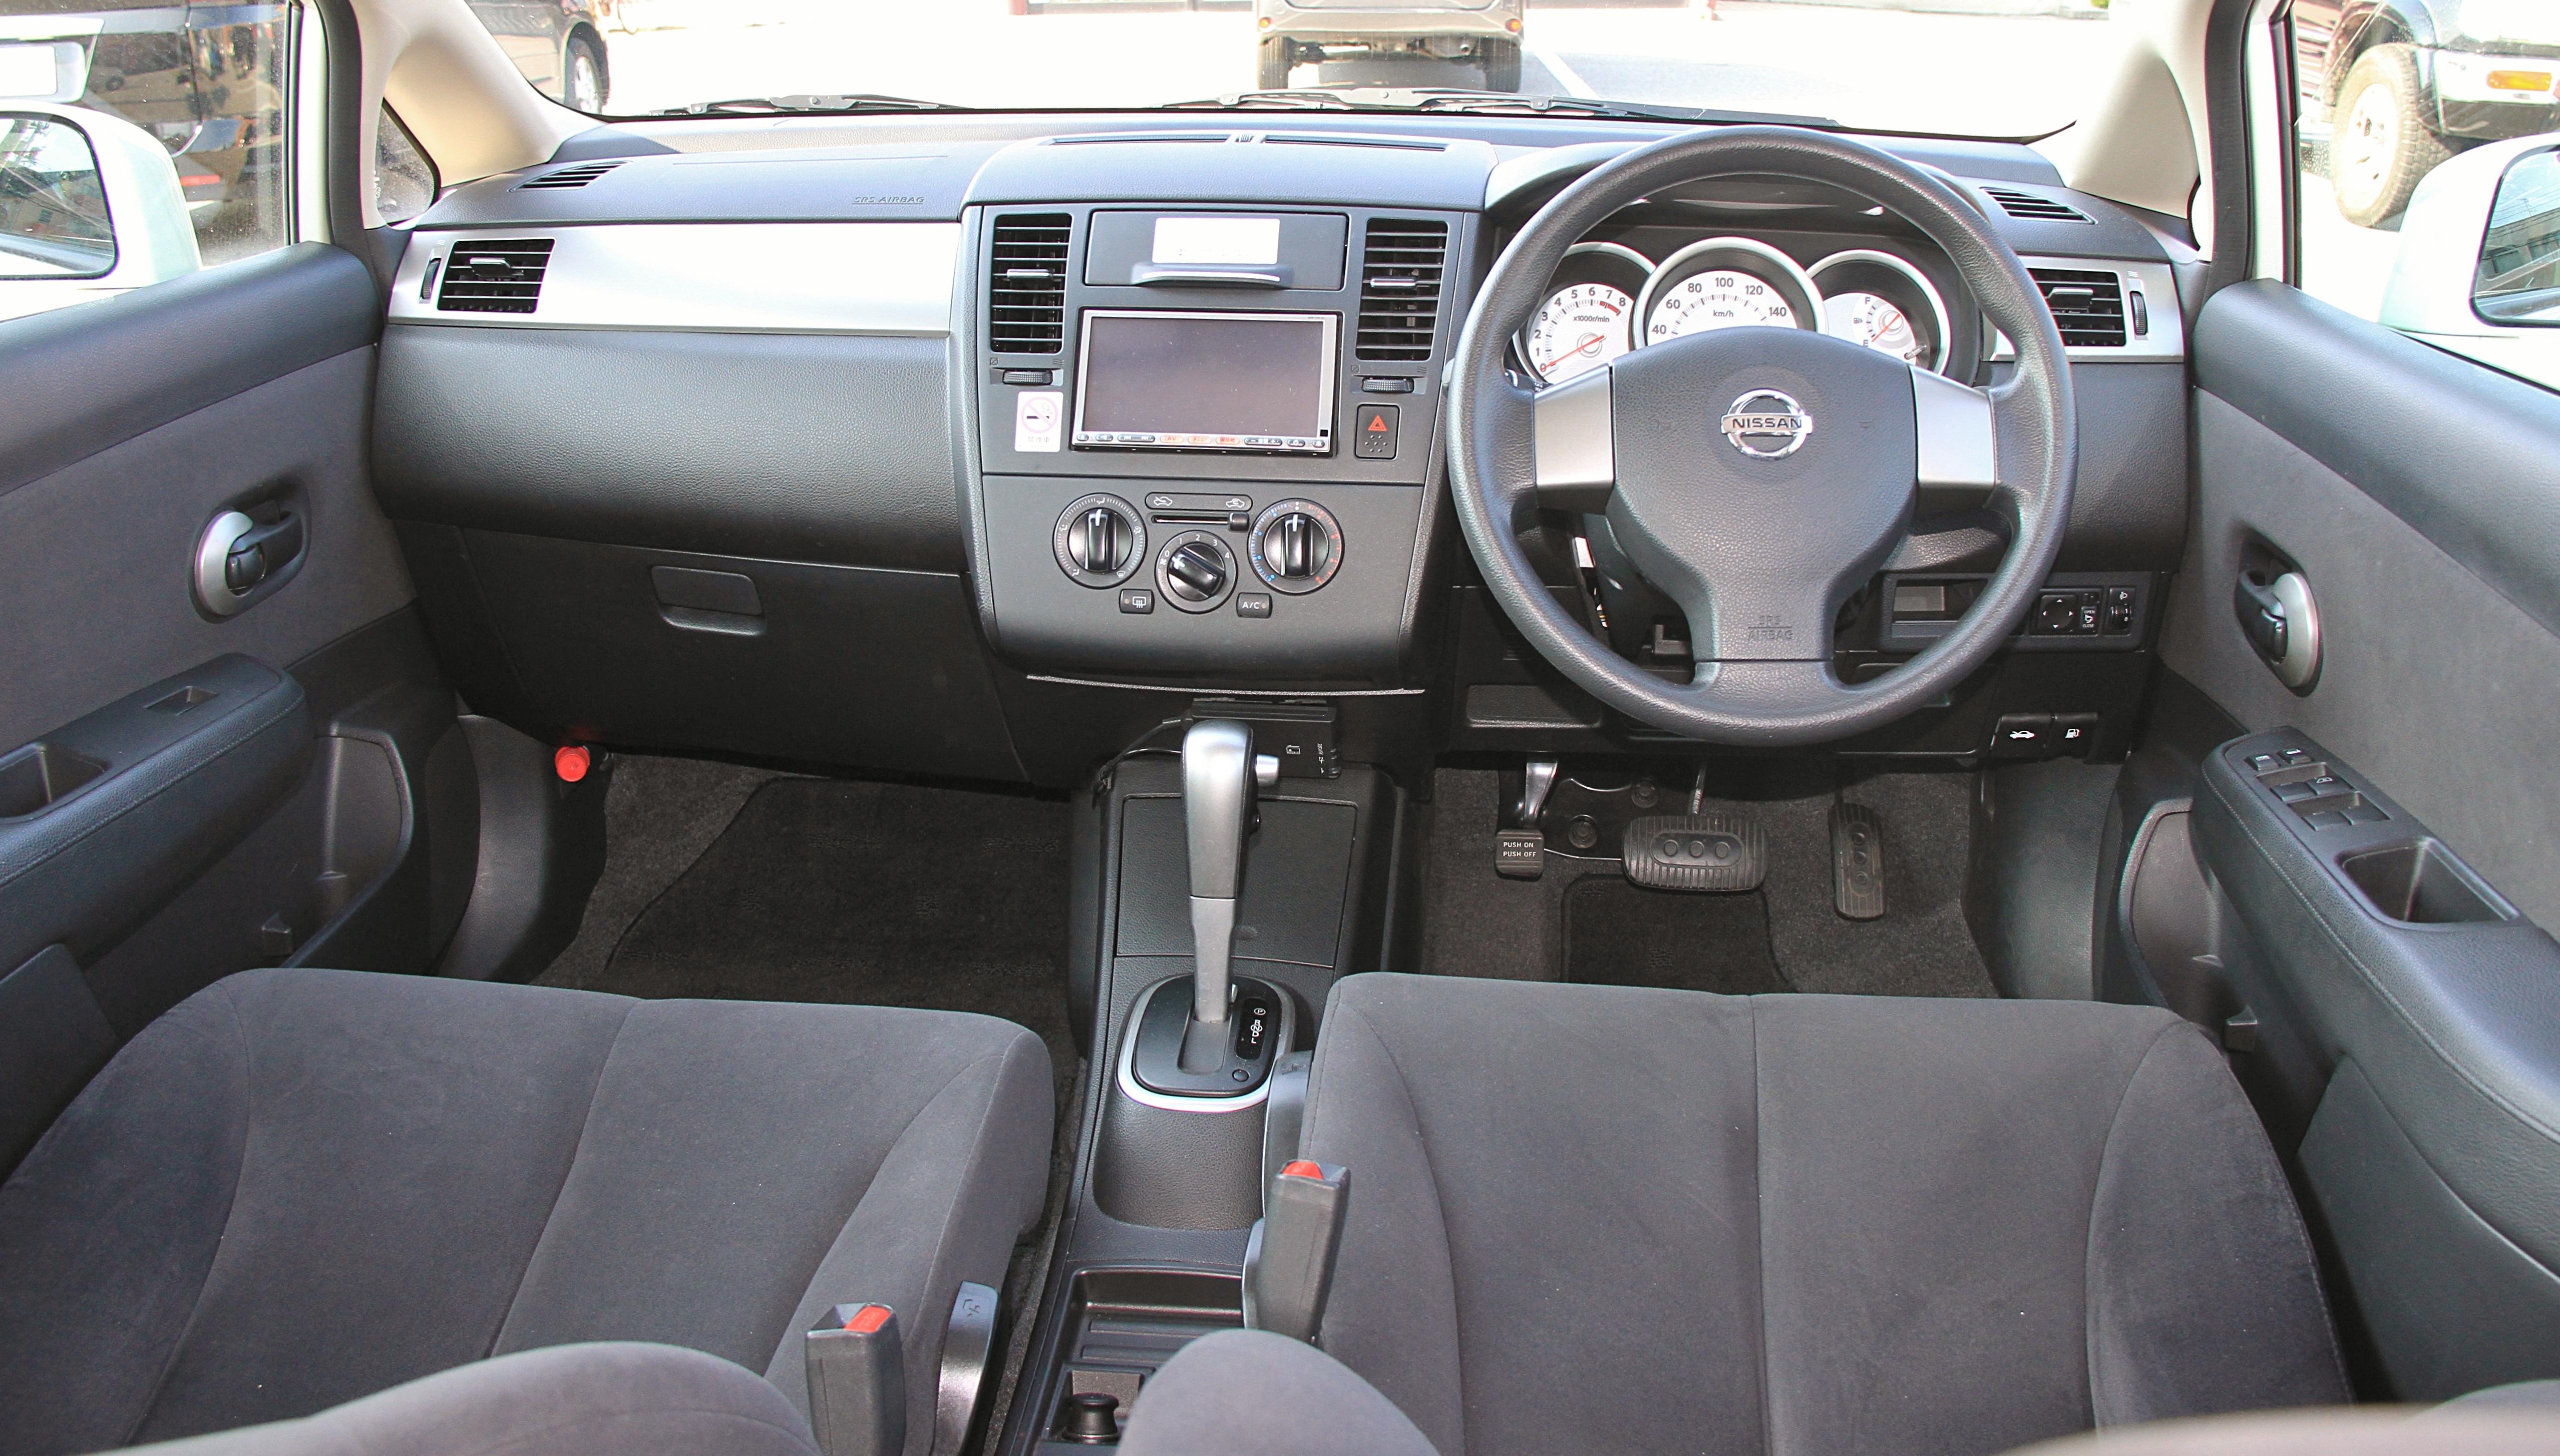 Nissan Tiida I 2004 - 2012 Sedan #5